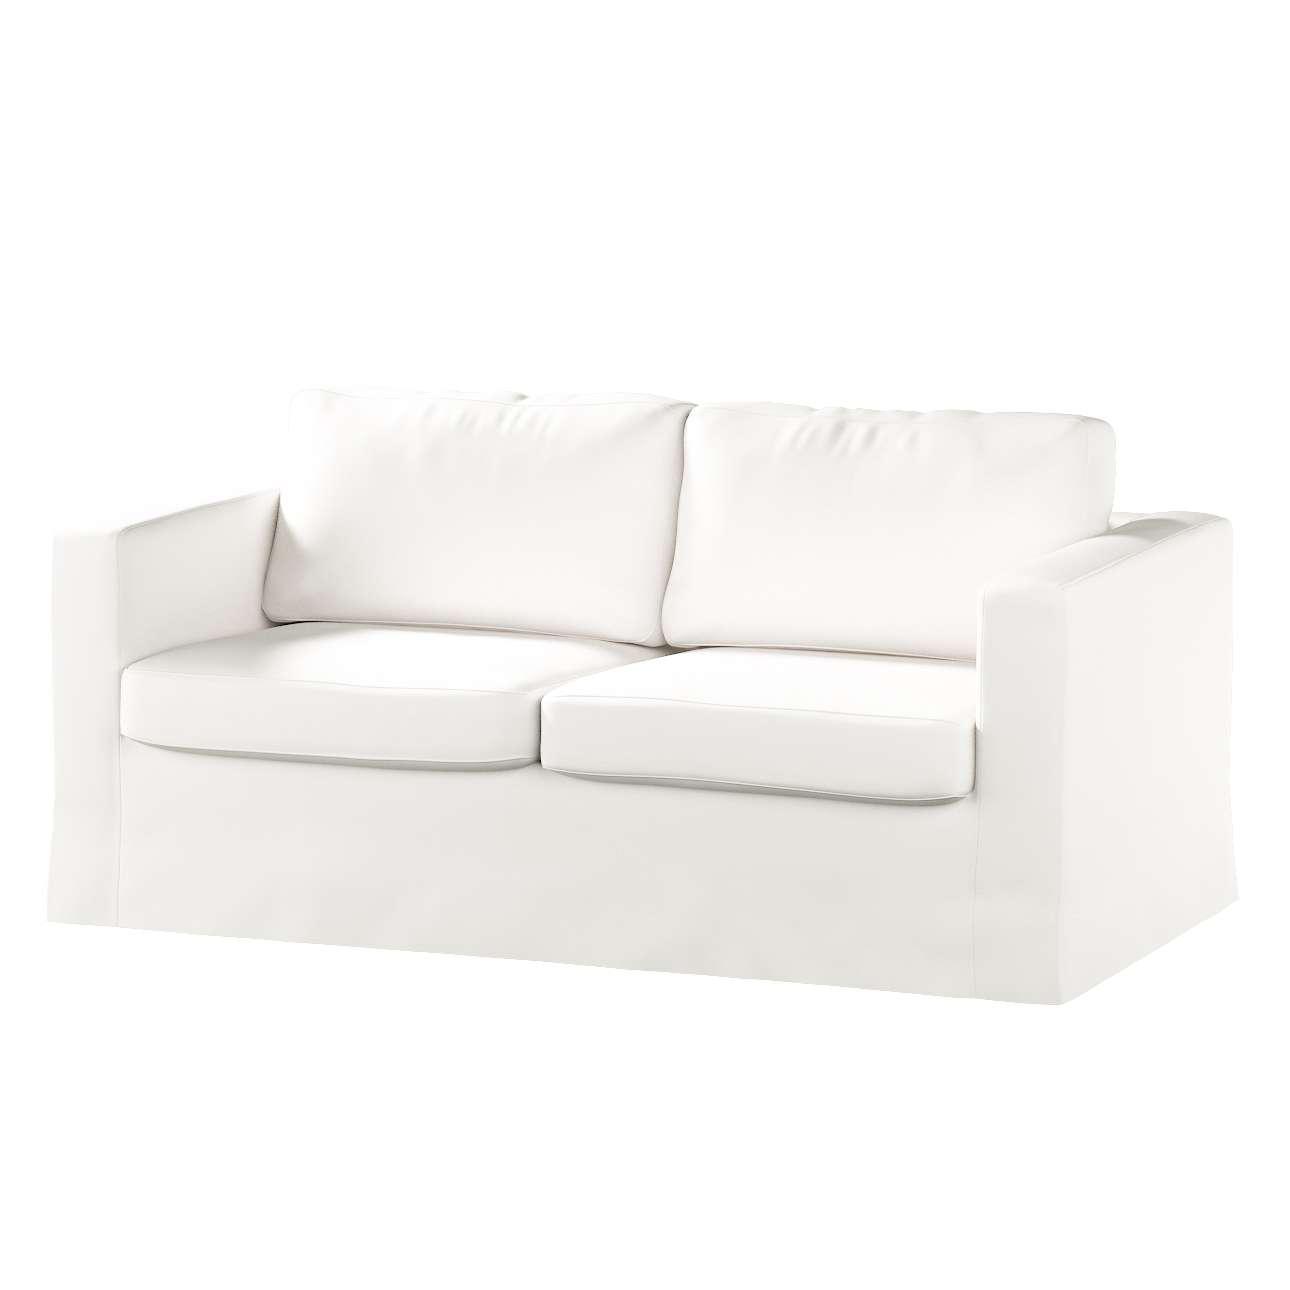 Picture of: Floor Length Karlstad 2 Seater Sofa Cover Pure White 702 34 Karlstad 2 Seat Sofa Dekoria